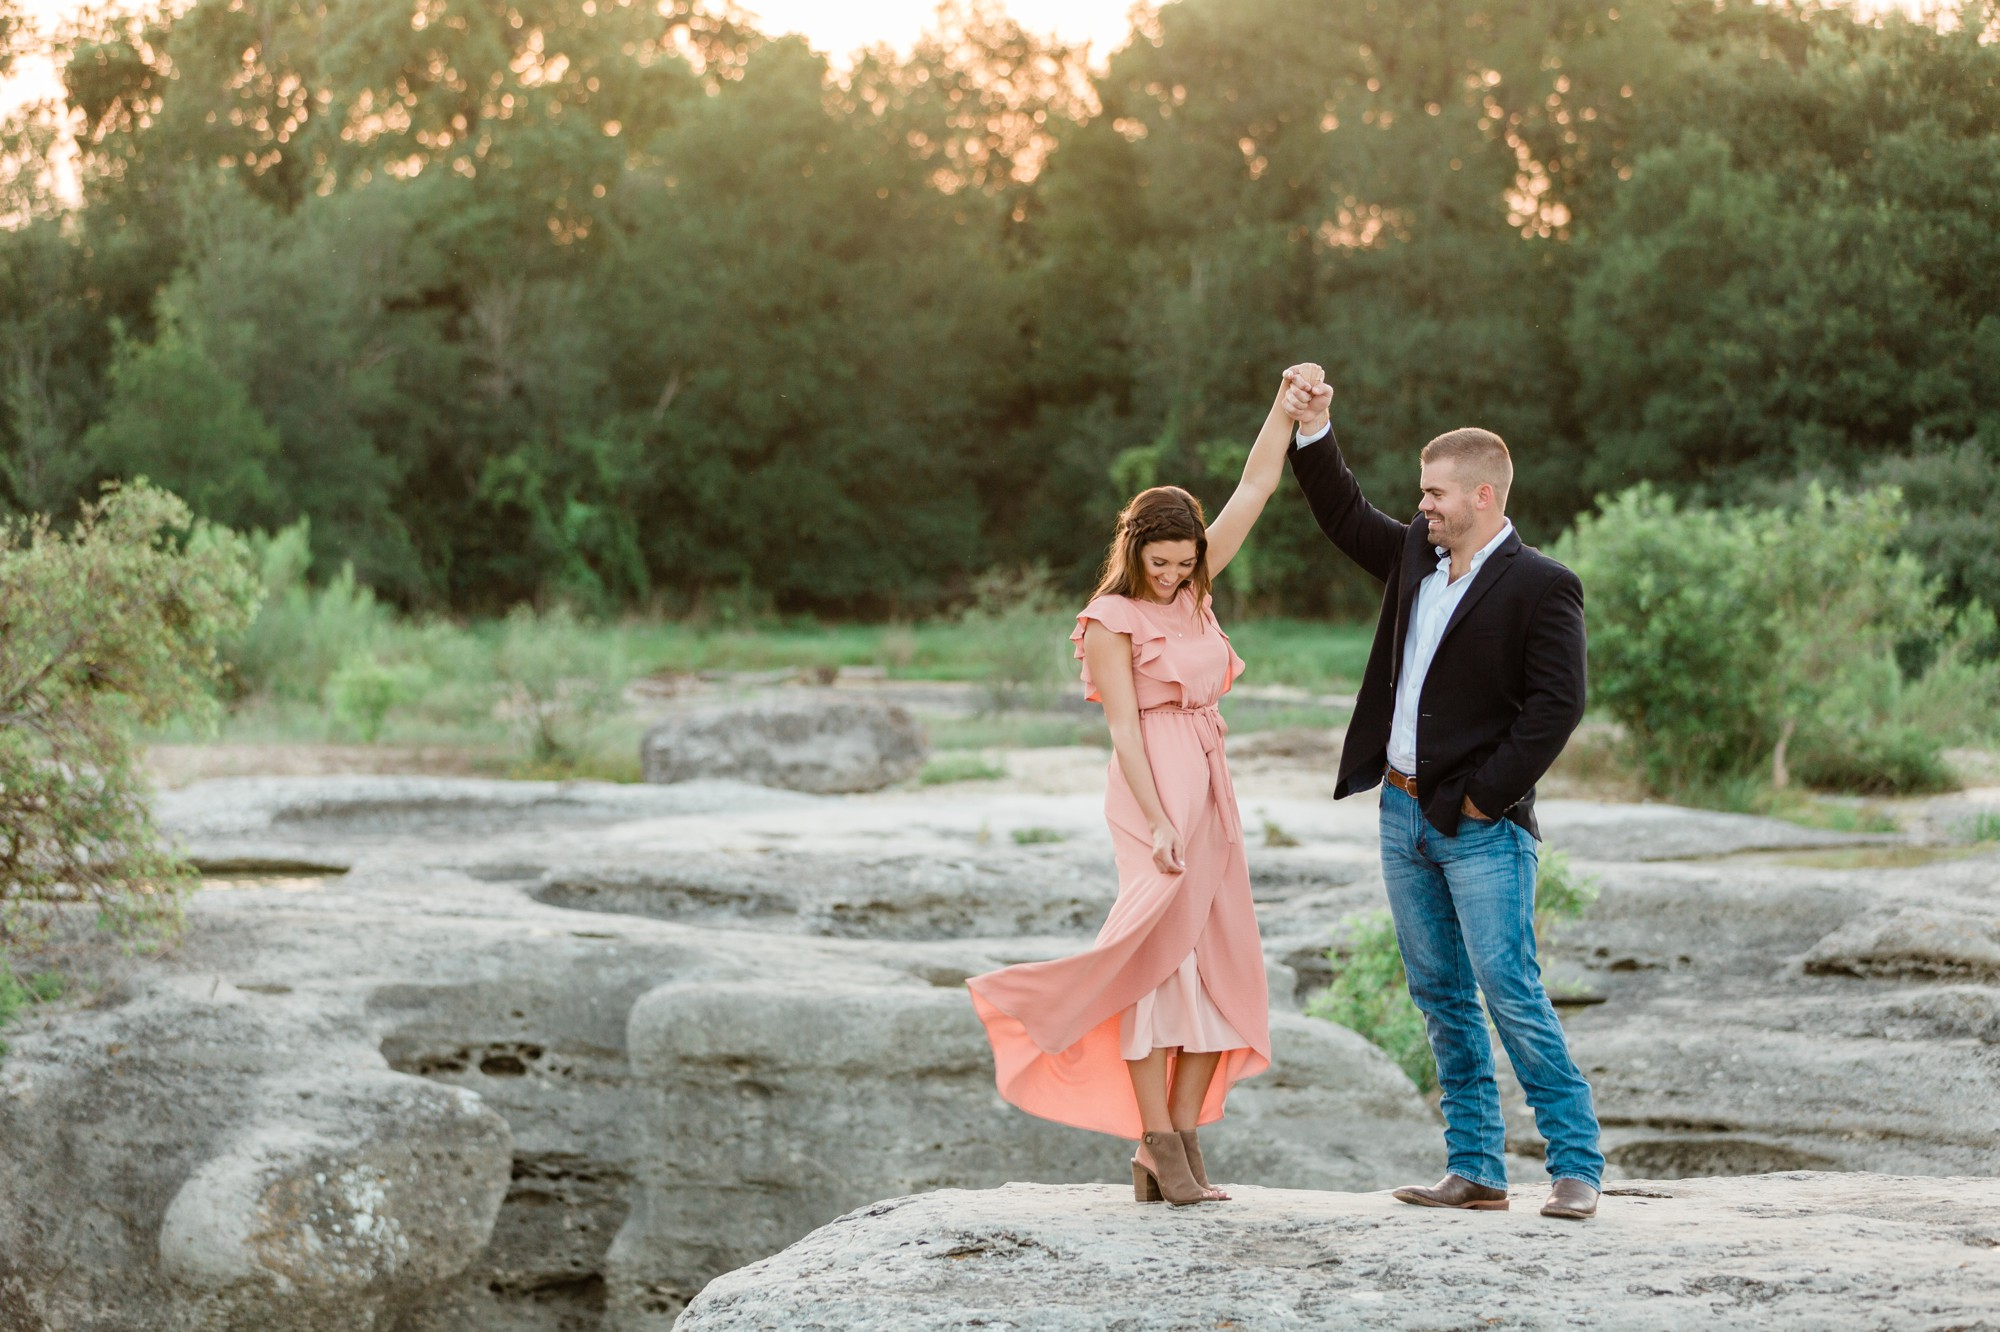 mckinney falls state park austin texas engagement photo